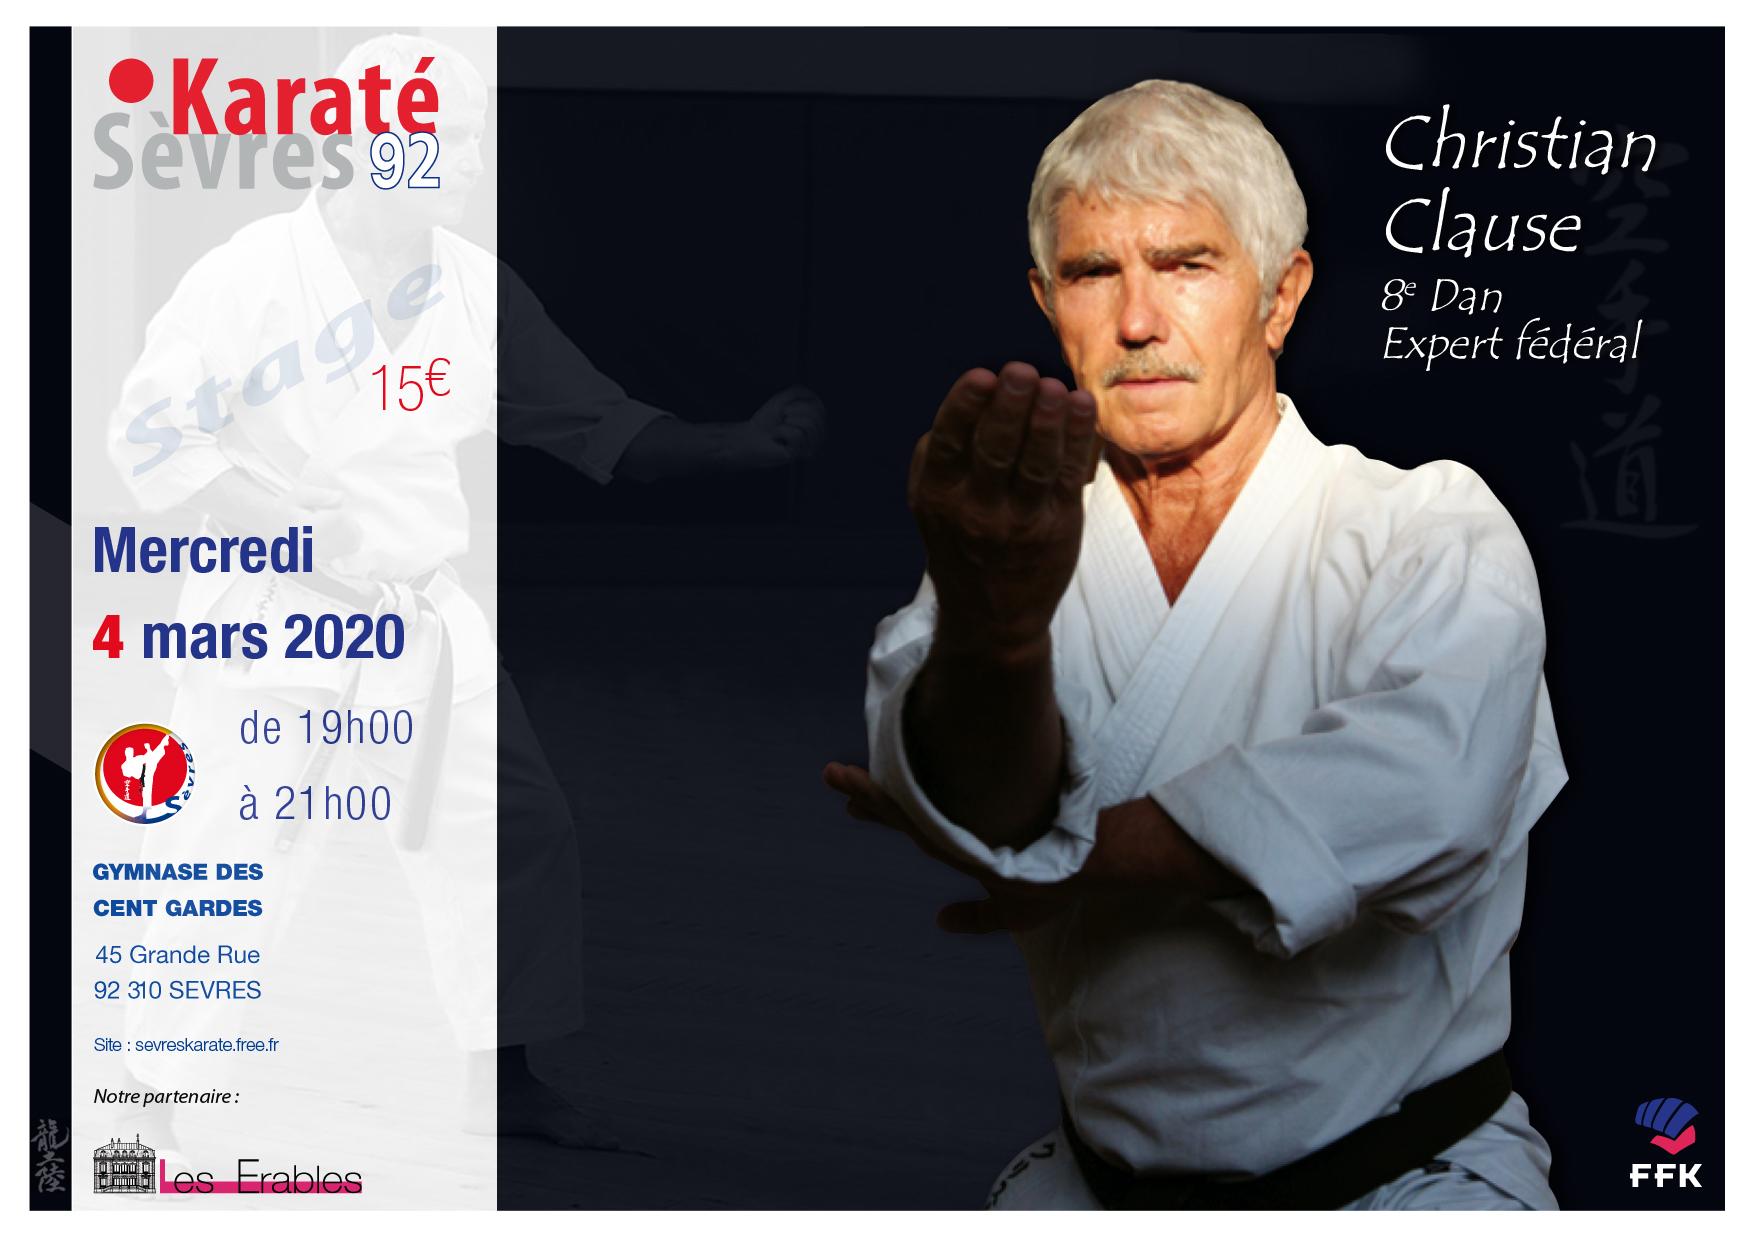 satge Christian Clause 2020